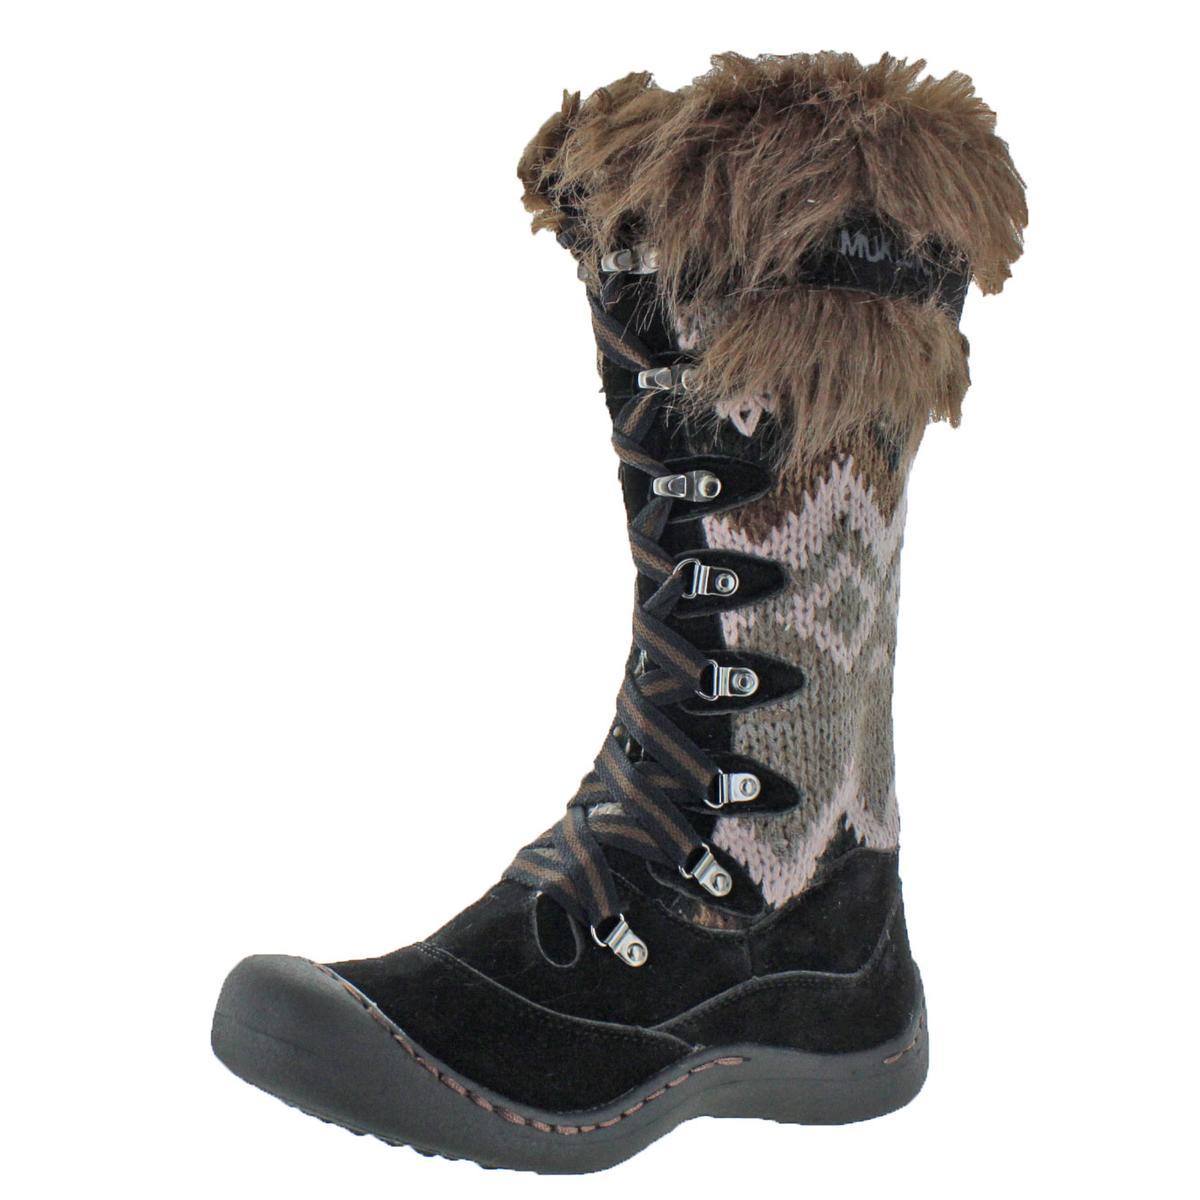 64649dfd511 Muk Luks Gwen Womens Faux Fur Knee-High Snow Boots